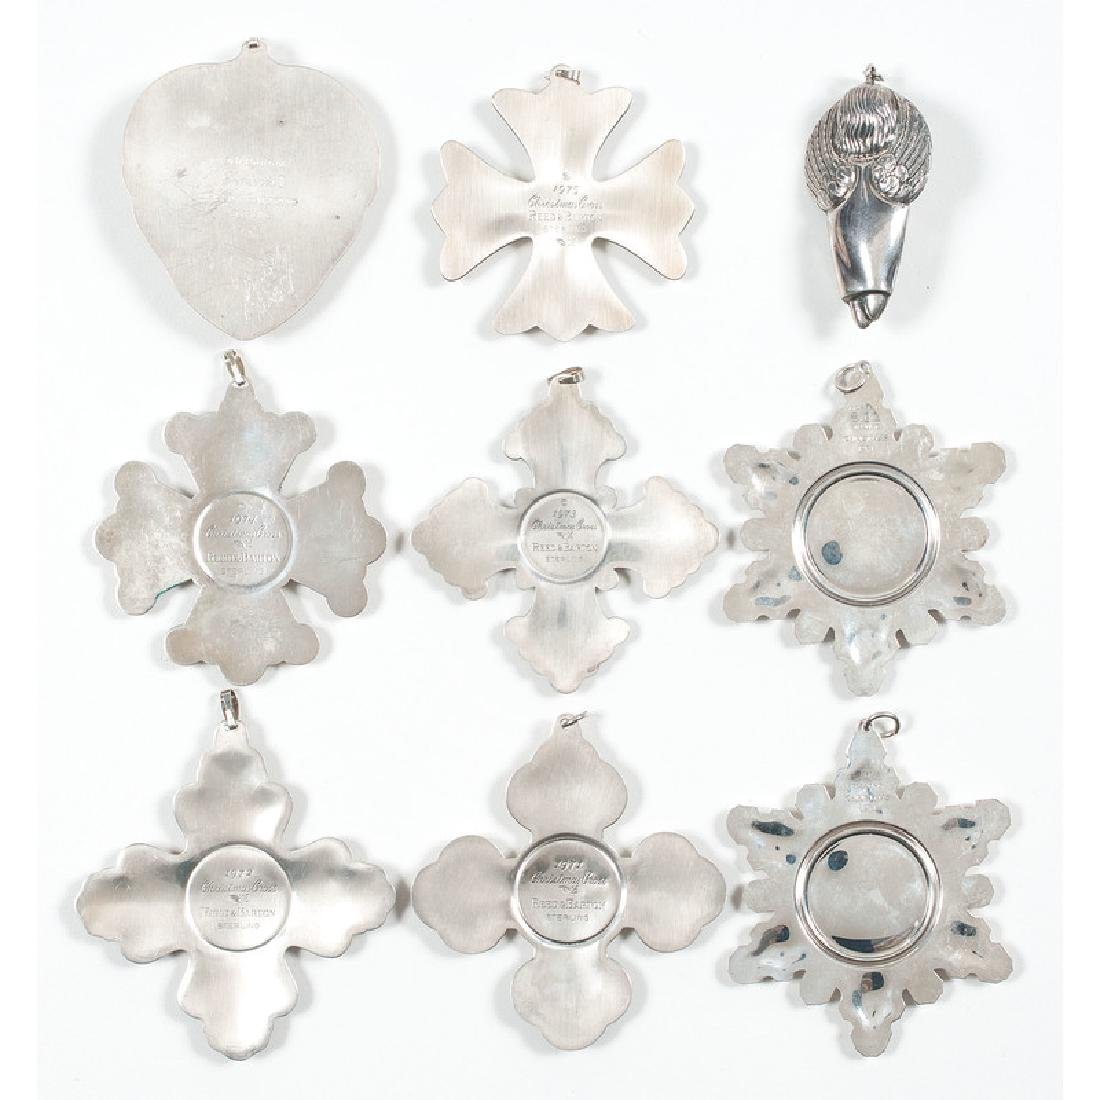 American Silver Christmas Ornaments - 2